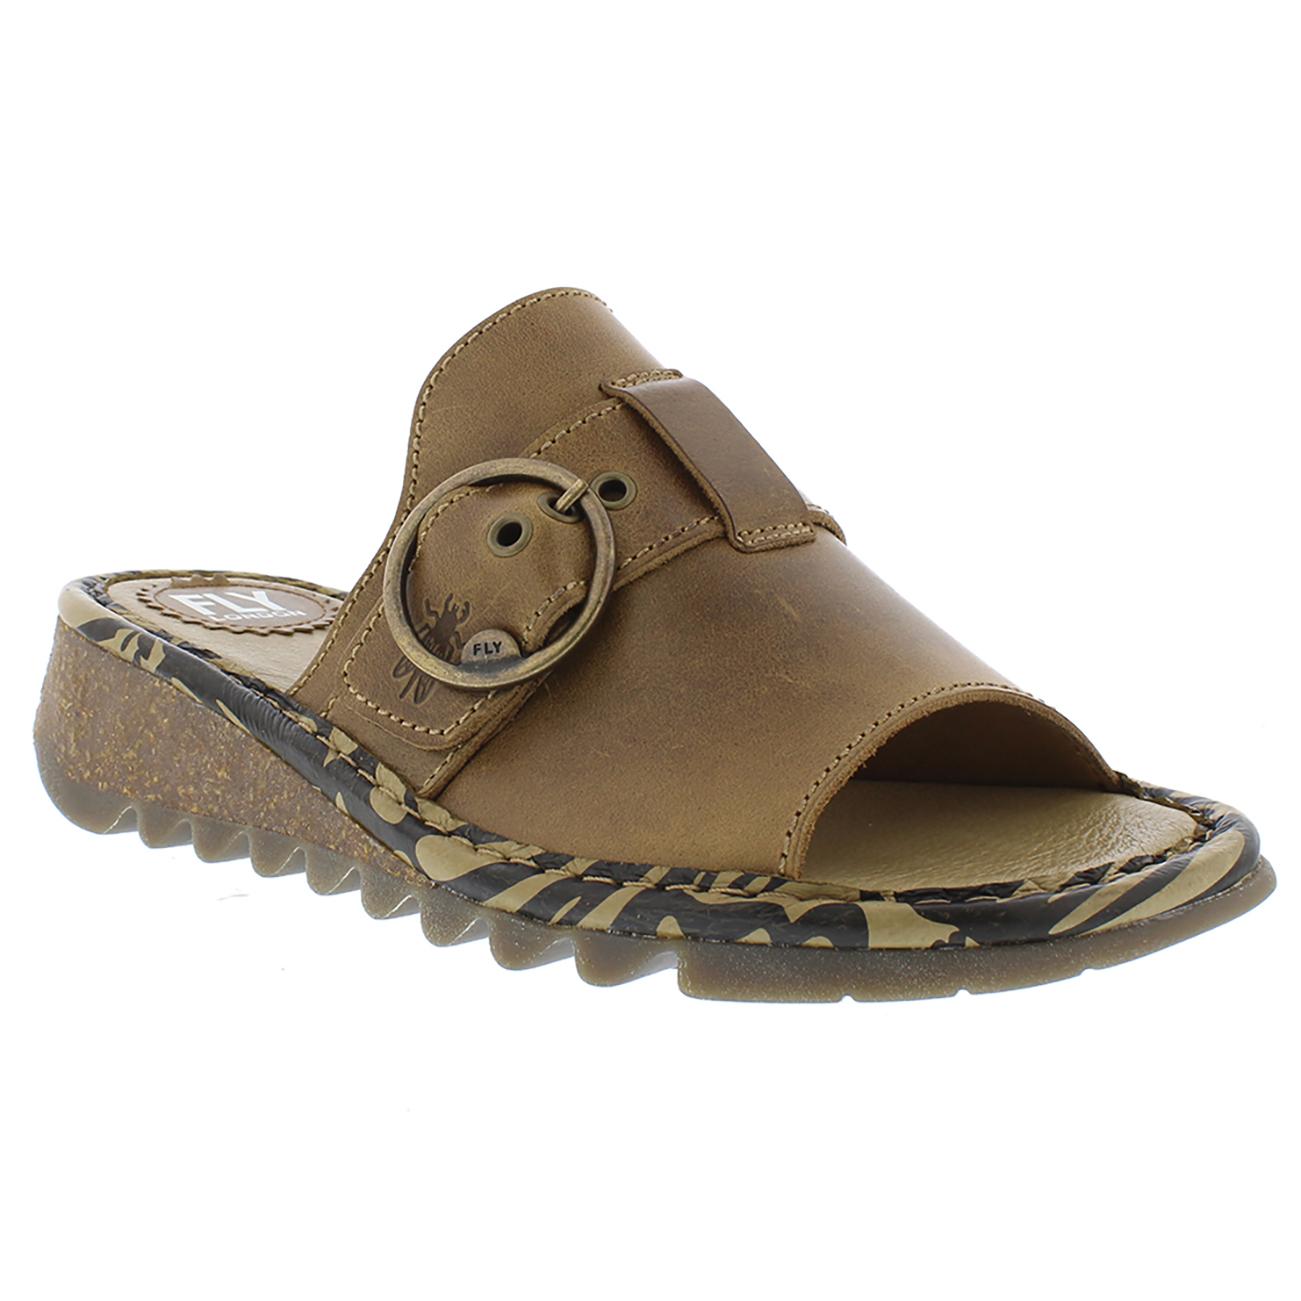 Womens Fly London Tani Bridle Leather Wedge Heel Heel Heel Open Toe Summer Sandals UK 3-9 b8f970